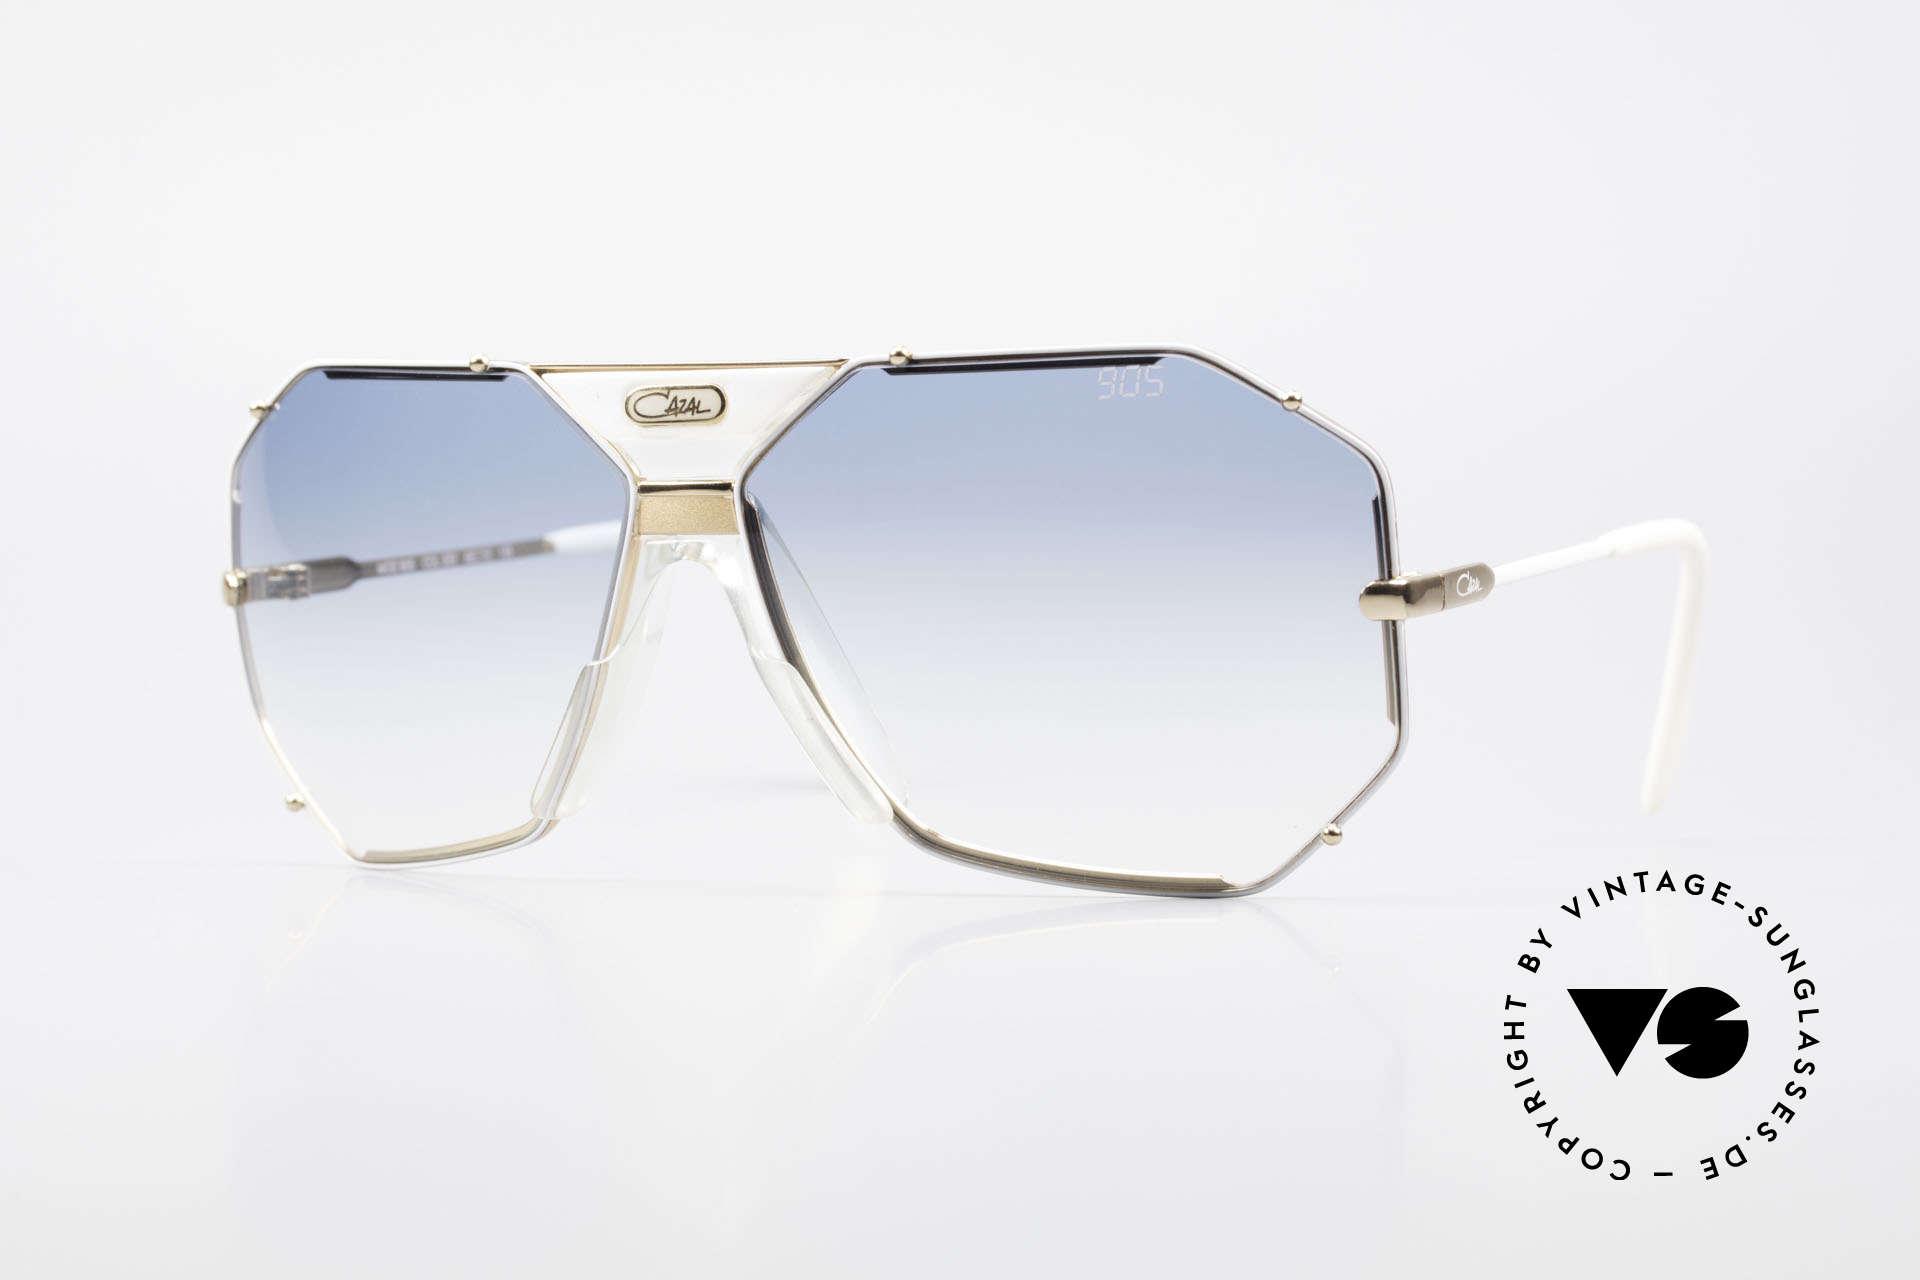 Cazal 905 Gwen Stefani Vintage Shades, famous Cazal designer sunglasses from 1989/90, Made for Men and Women